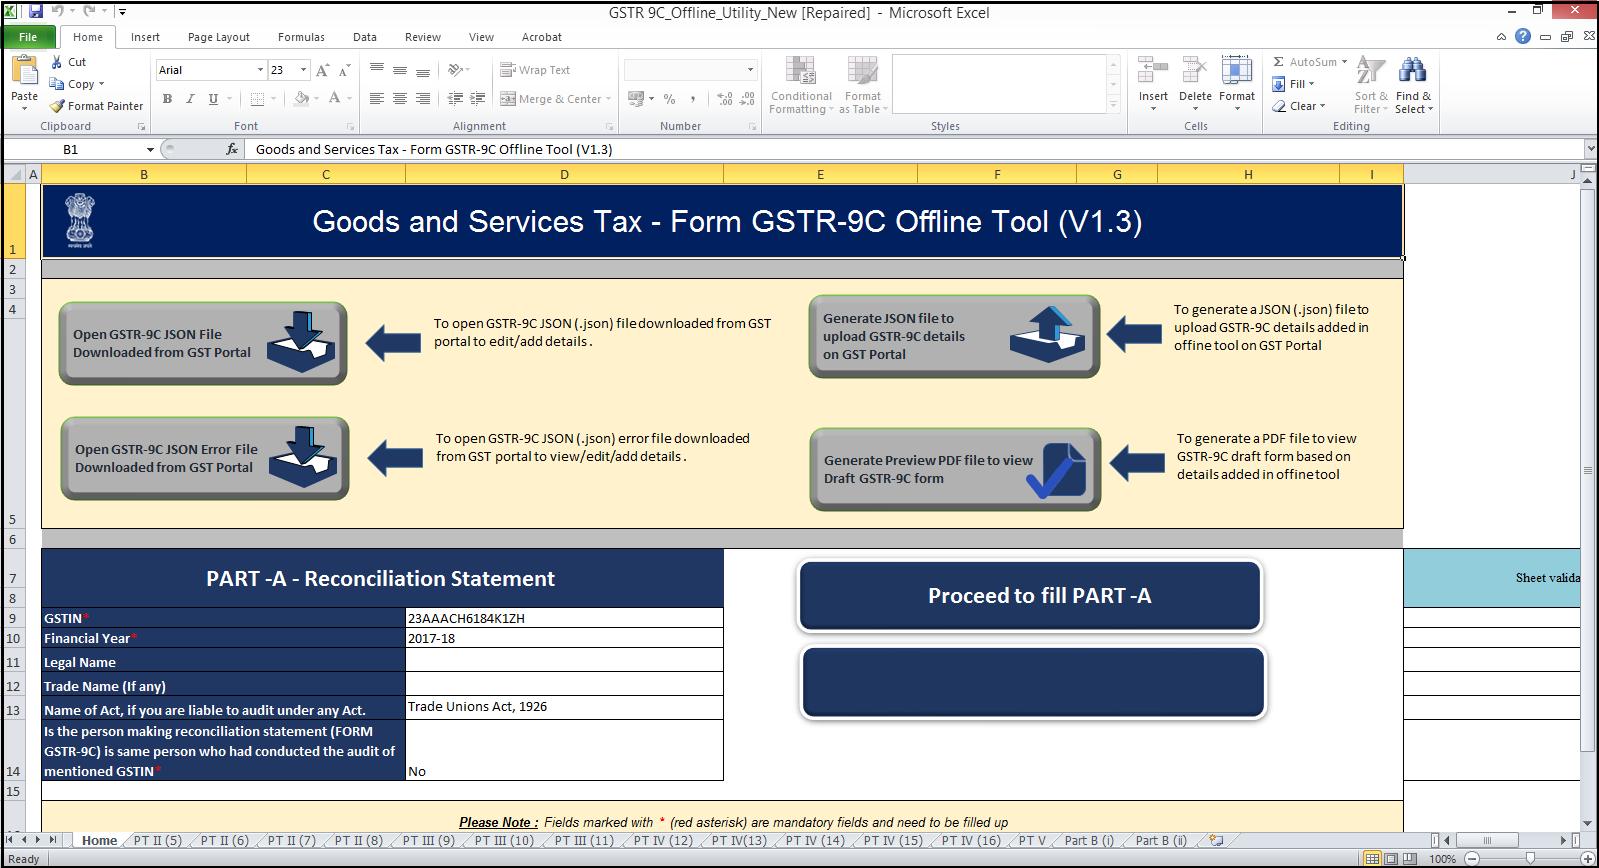 5.GSTR-9C JSON creation and upload-GST portal